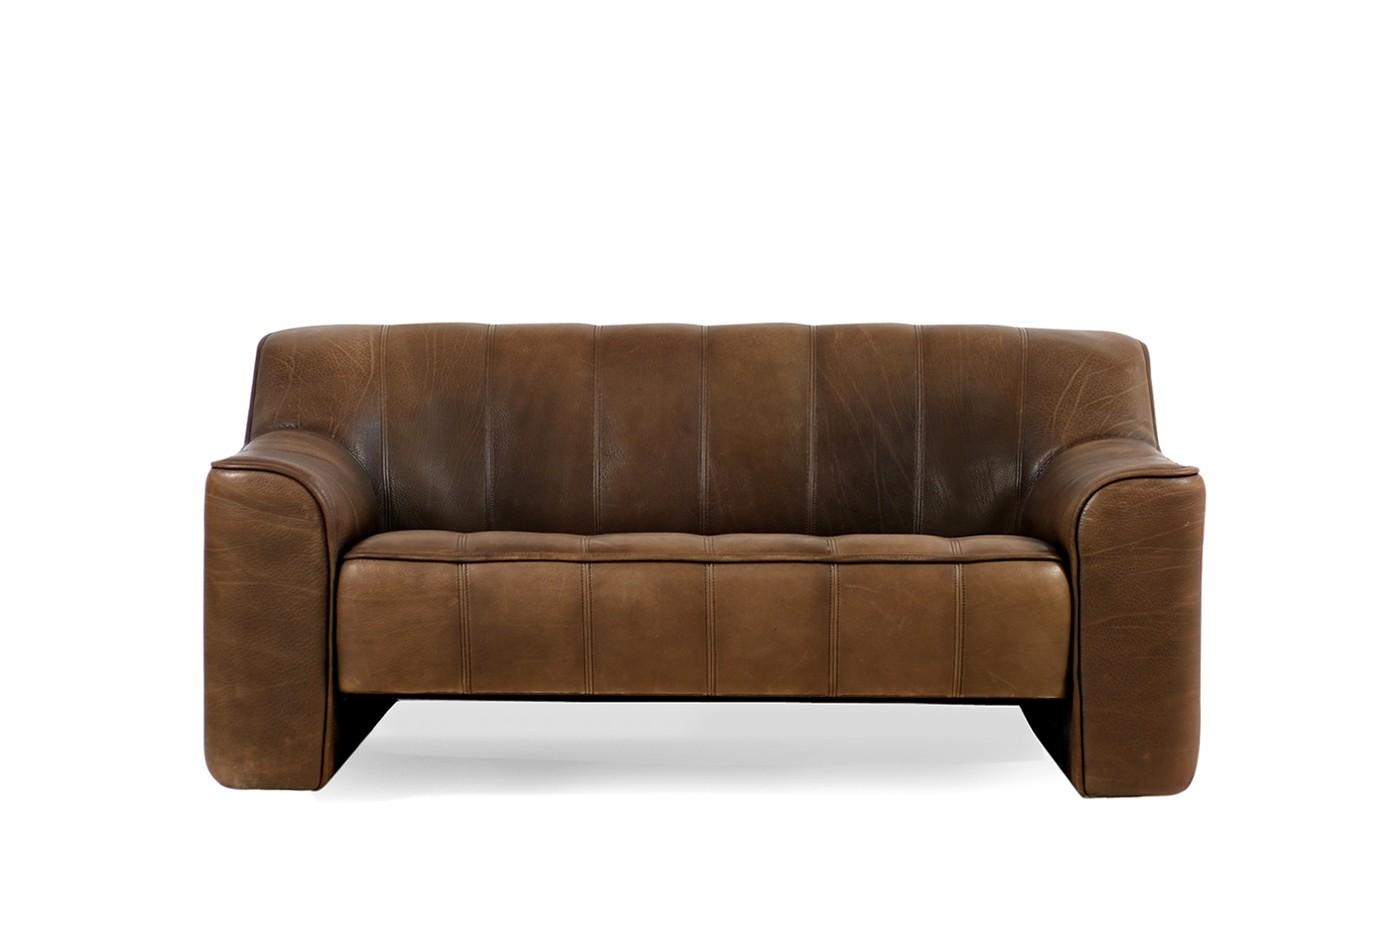 Full Size of De Sede Sofa Uk Gebraucht Kaufen Ds 600 Usa Outlet Endless By Preise Furniture Sessel 1970s 44 Two Seat Brown Buffalo Leather Kunstleder Bodenbeläge Küche Sofa De Sede Sofa